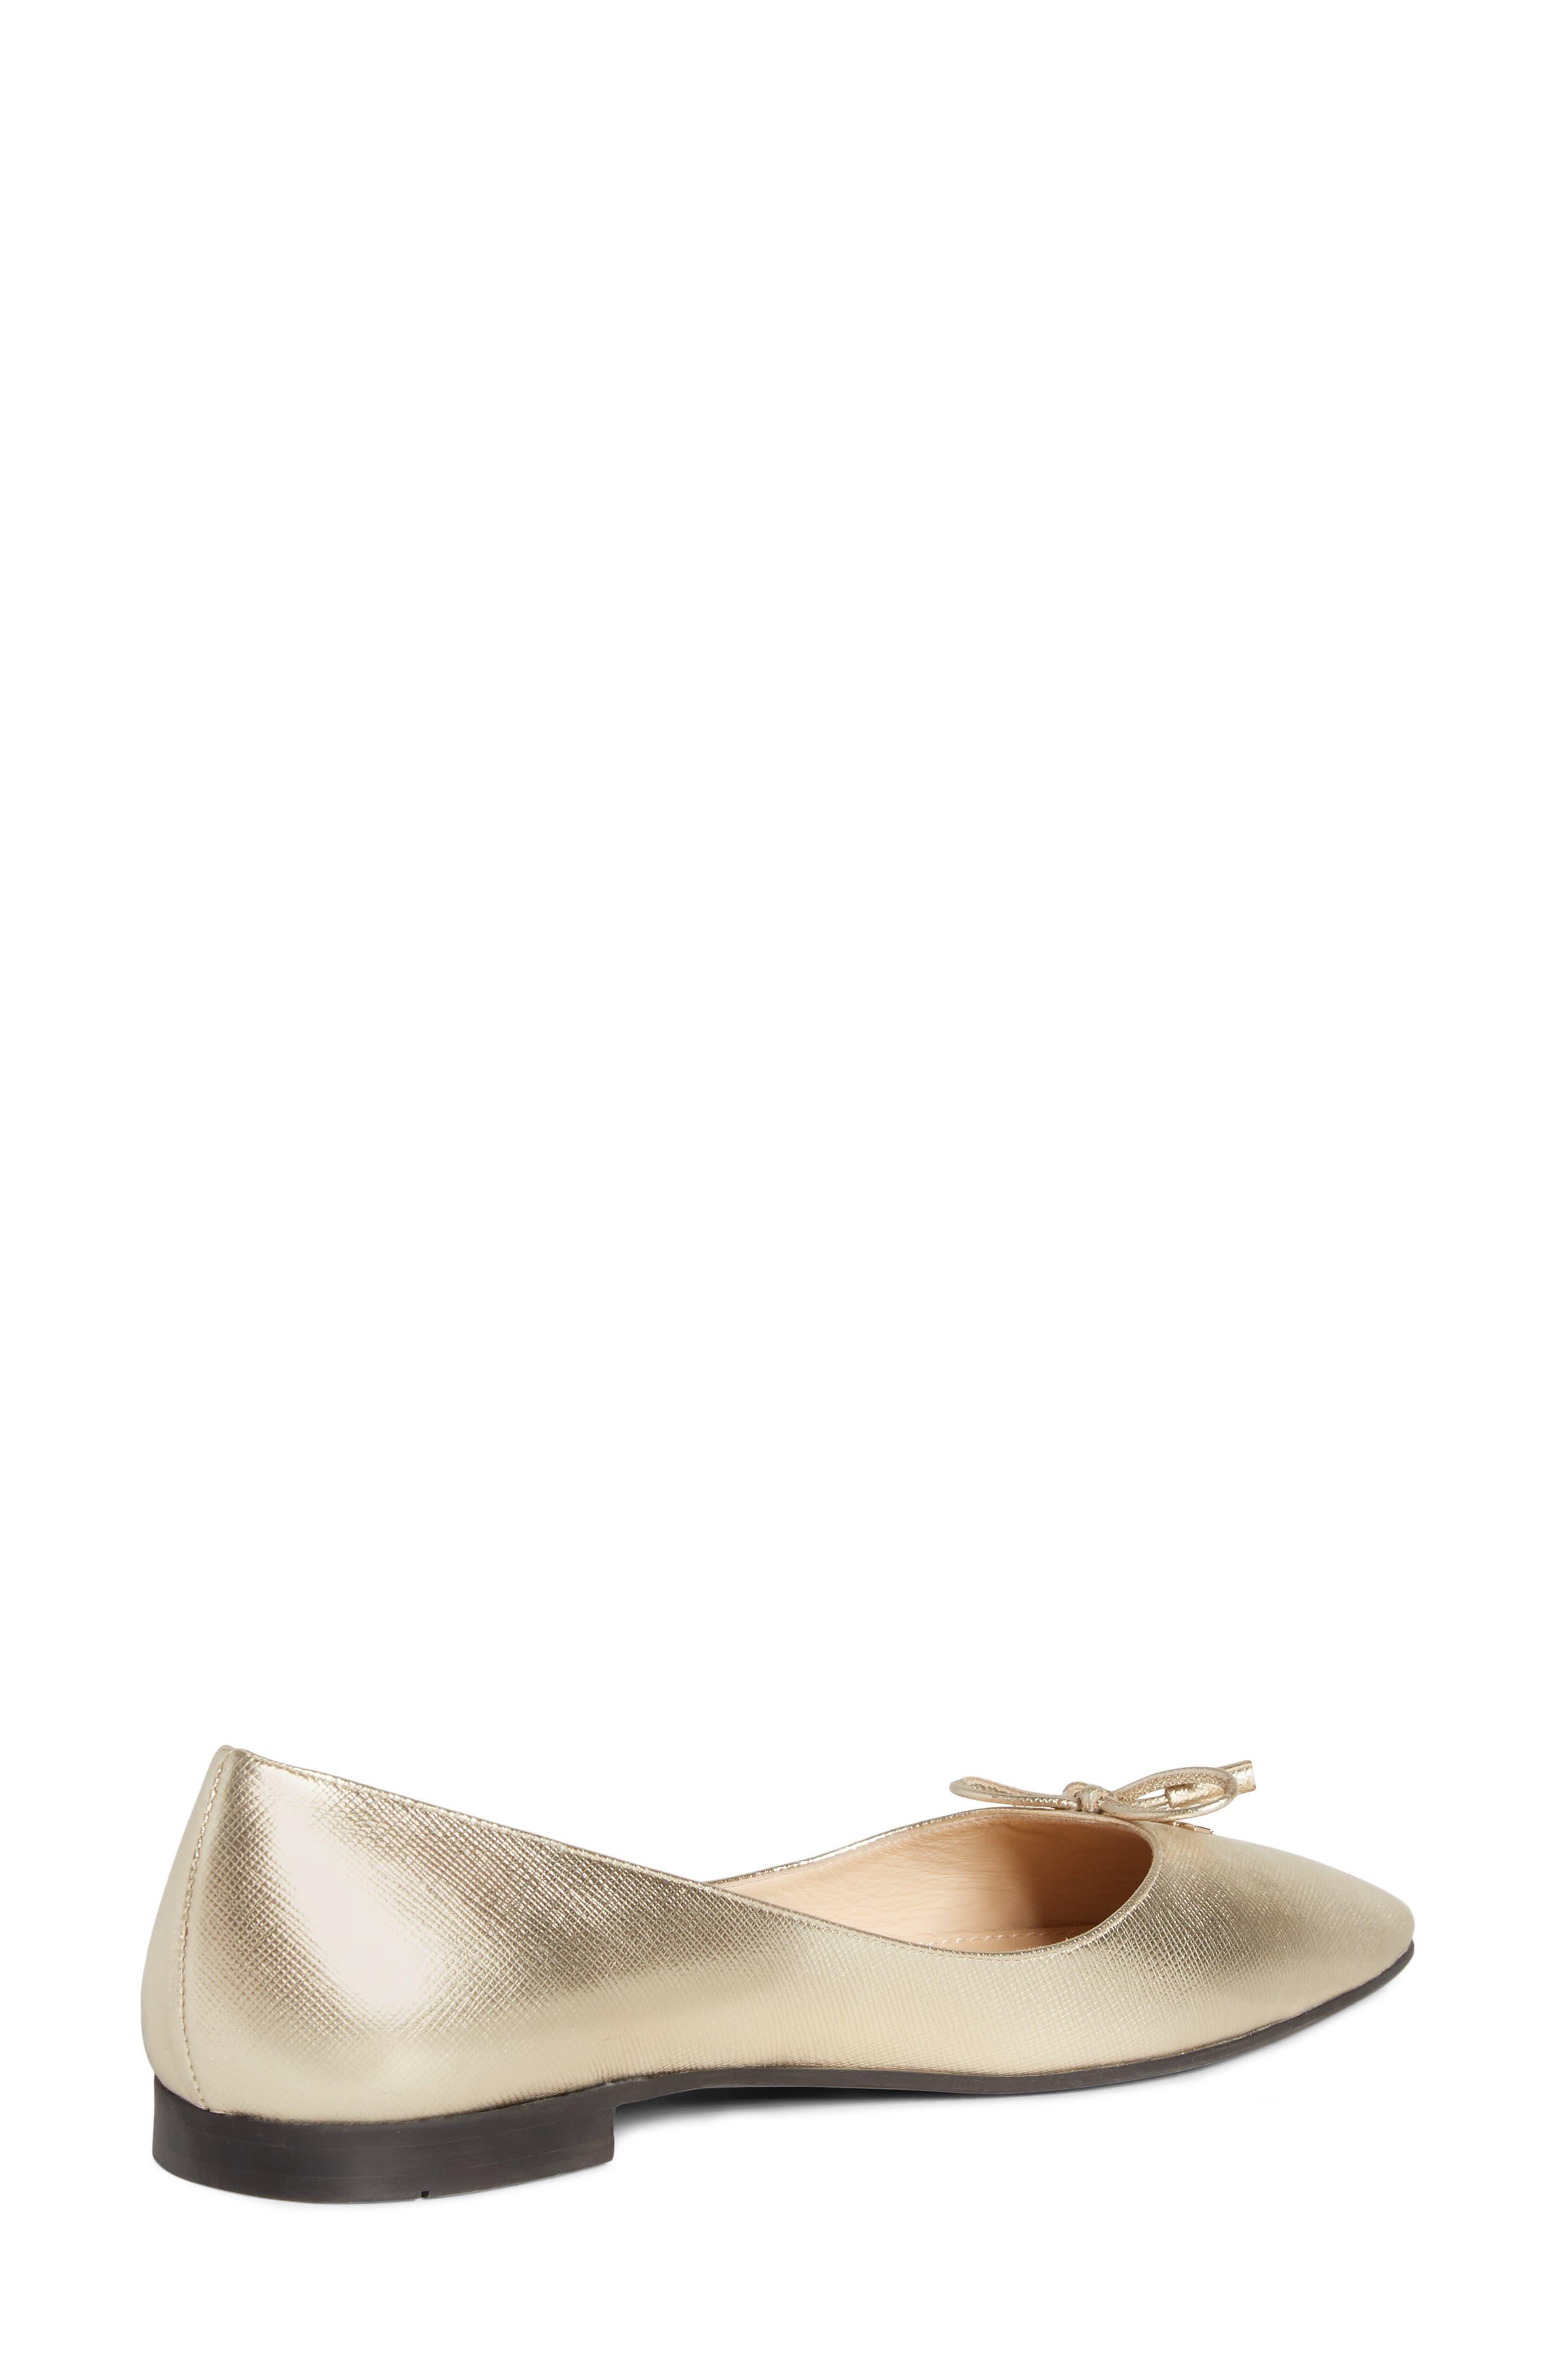 3ee7e92c84 Women's Prada Flats & Ballet Flats | Nordstrom